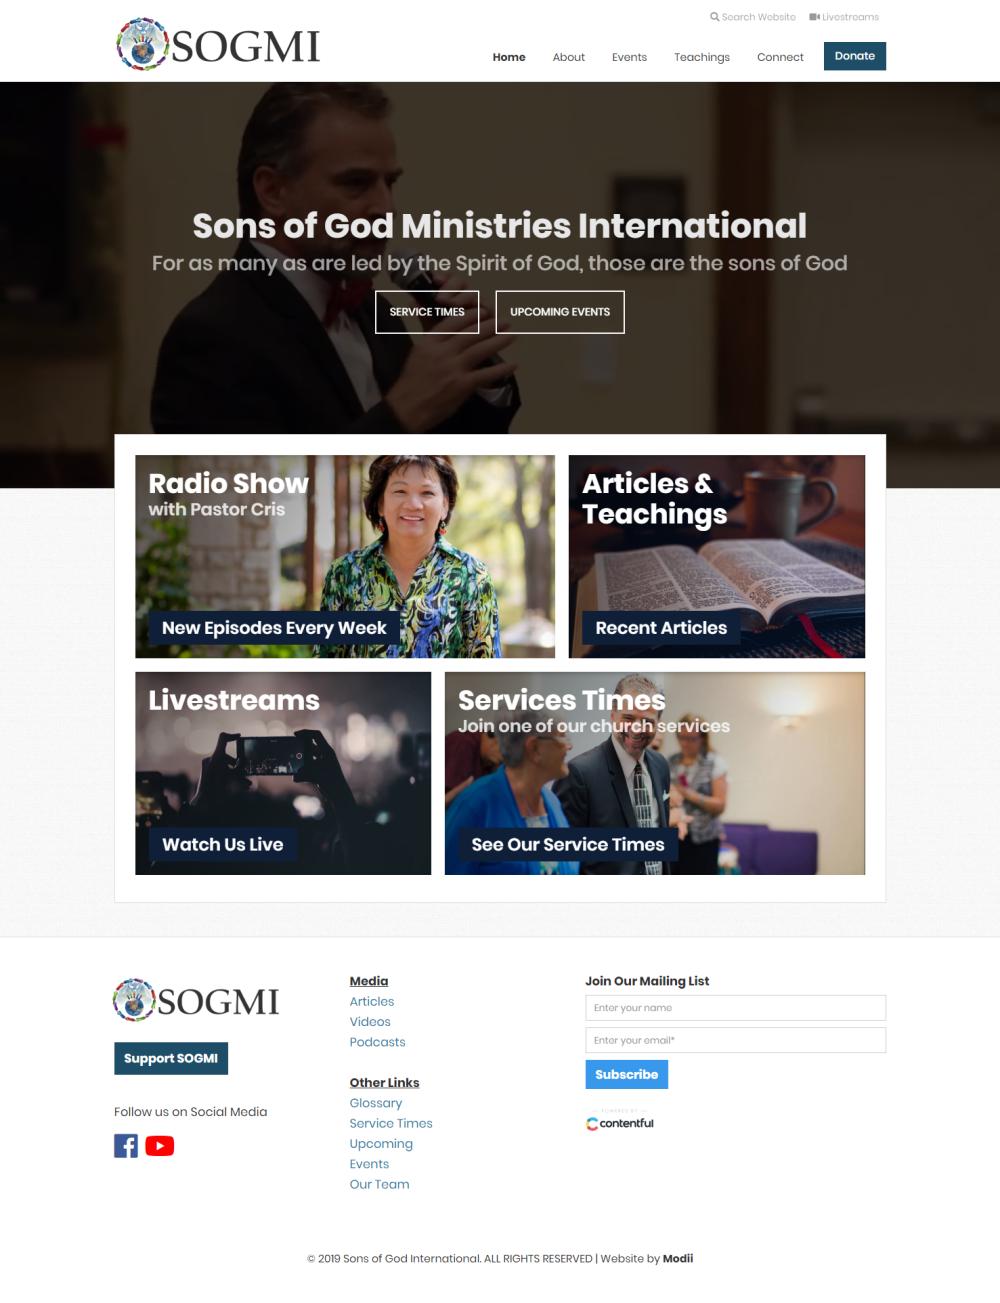 Responsive homepage for SOGMI